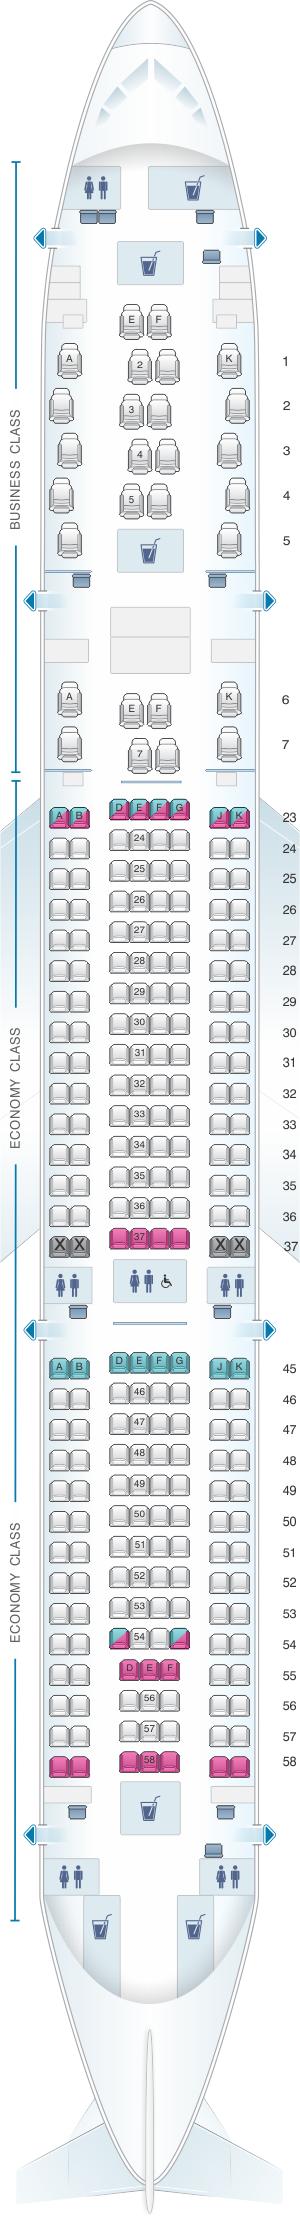 Seat map for Qantas Airways Airbus A330 200 Domestic 251PAX